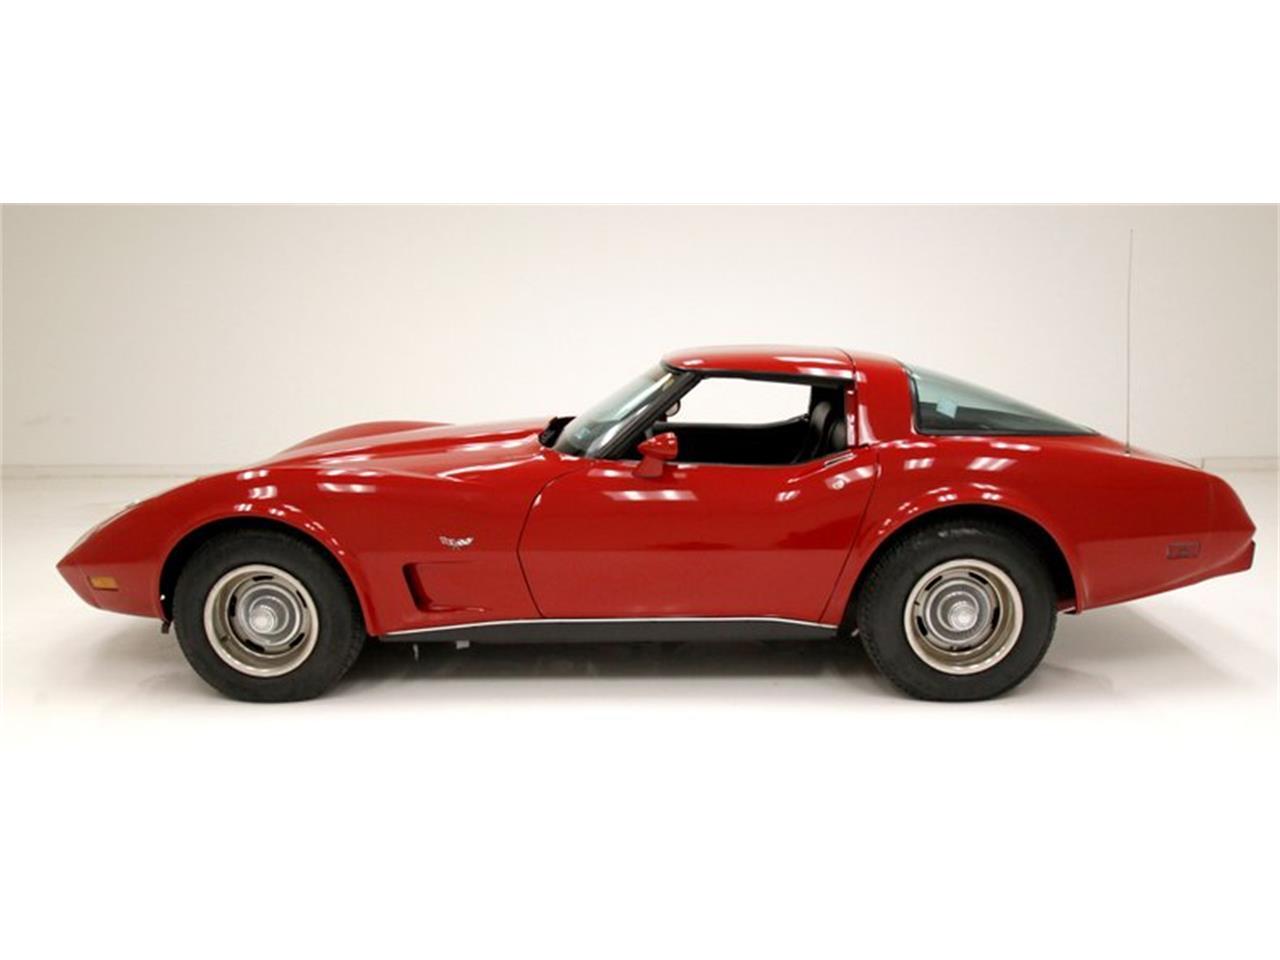 1979 Chevrolet Corvette (CC-1414110) for sale in Morgantown, Pennsylvania